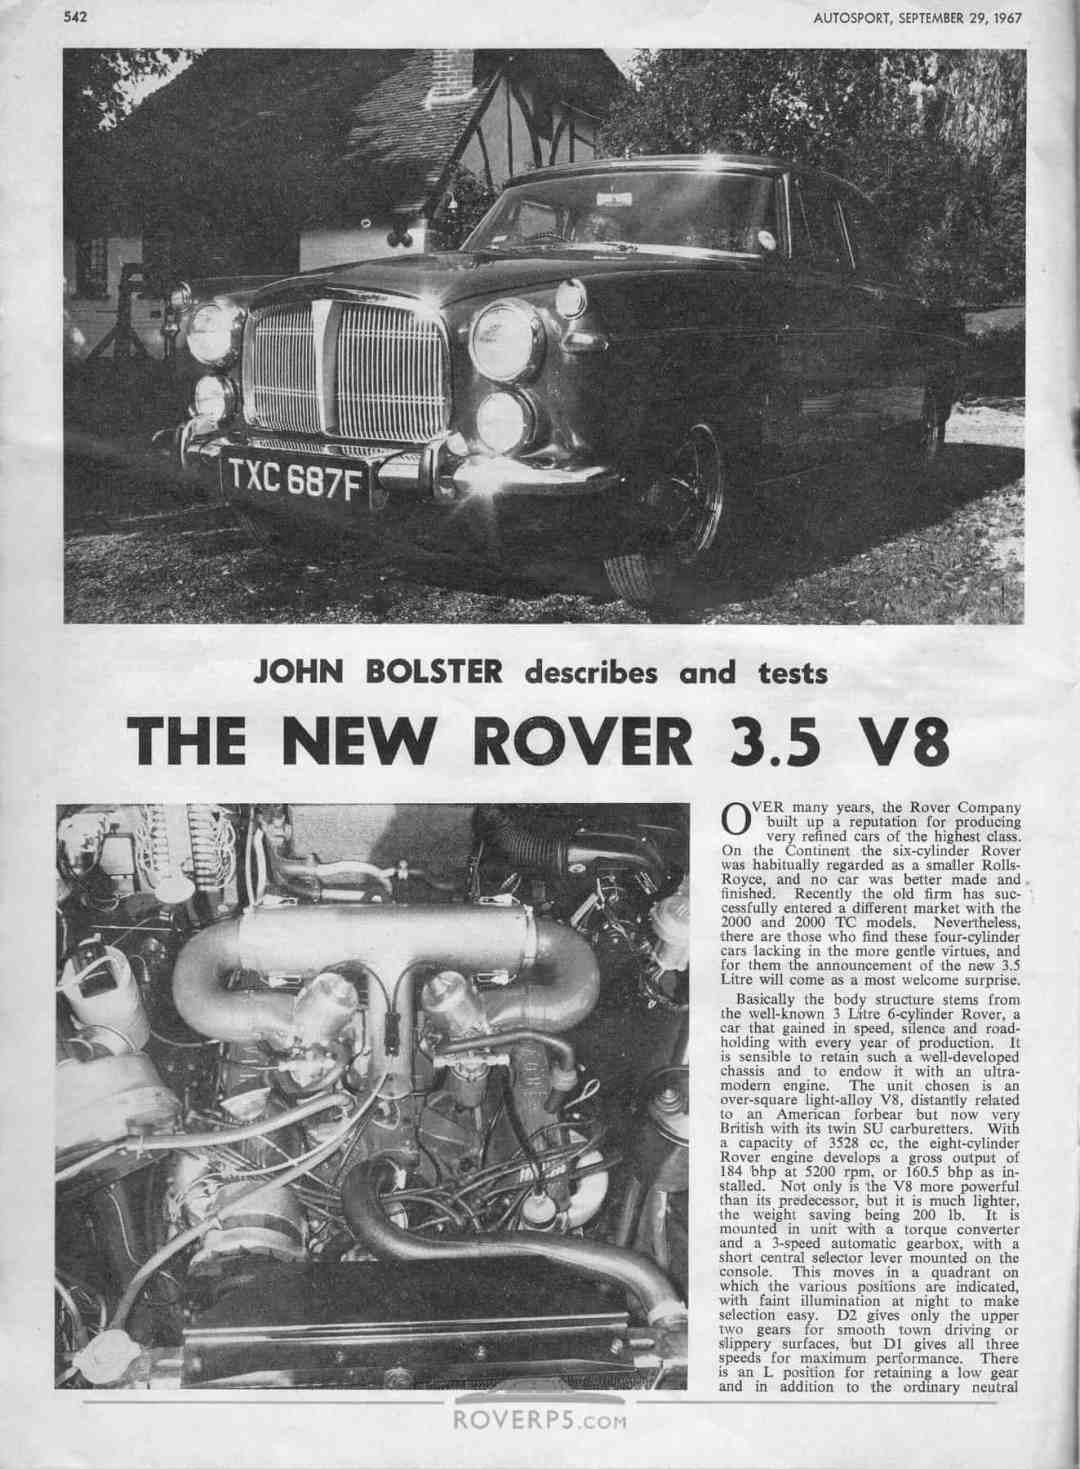 Magazine - 19670929 - Autosport - Page 542